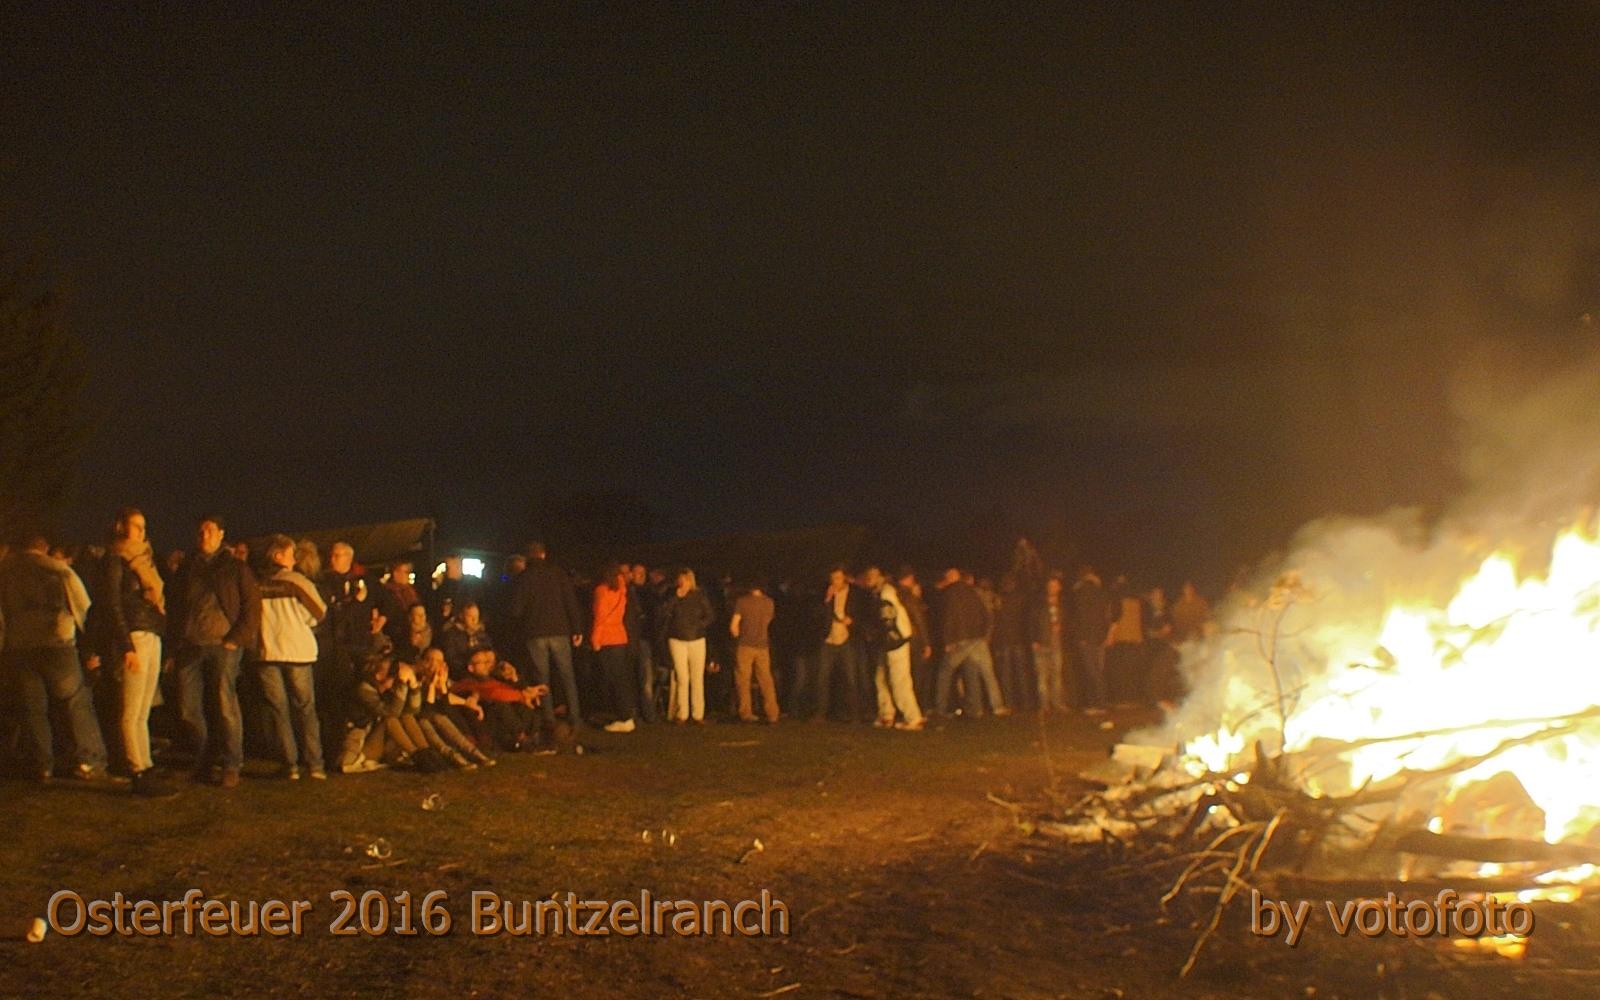 Osterfeuer 2016 Buntzelranch  159